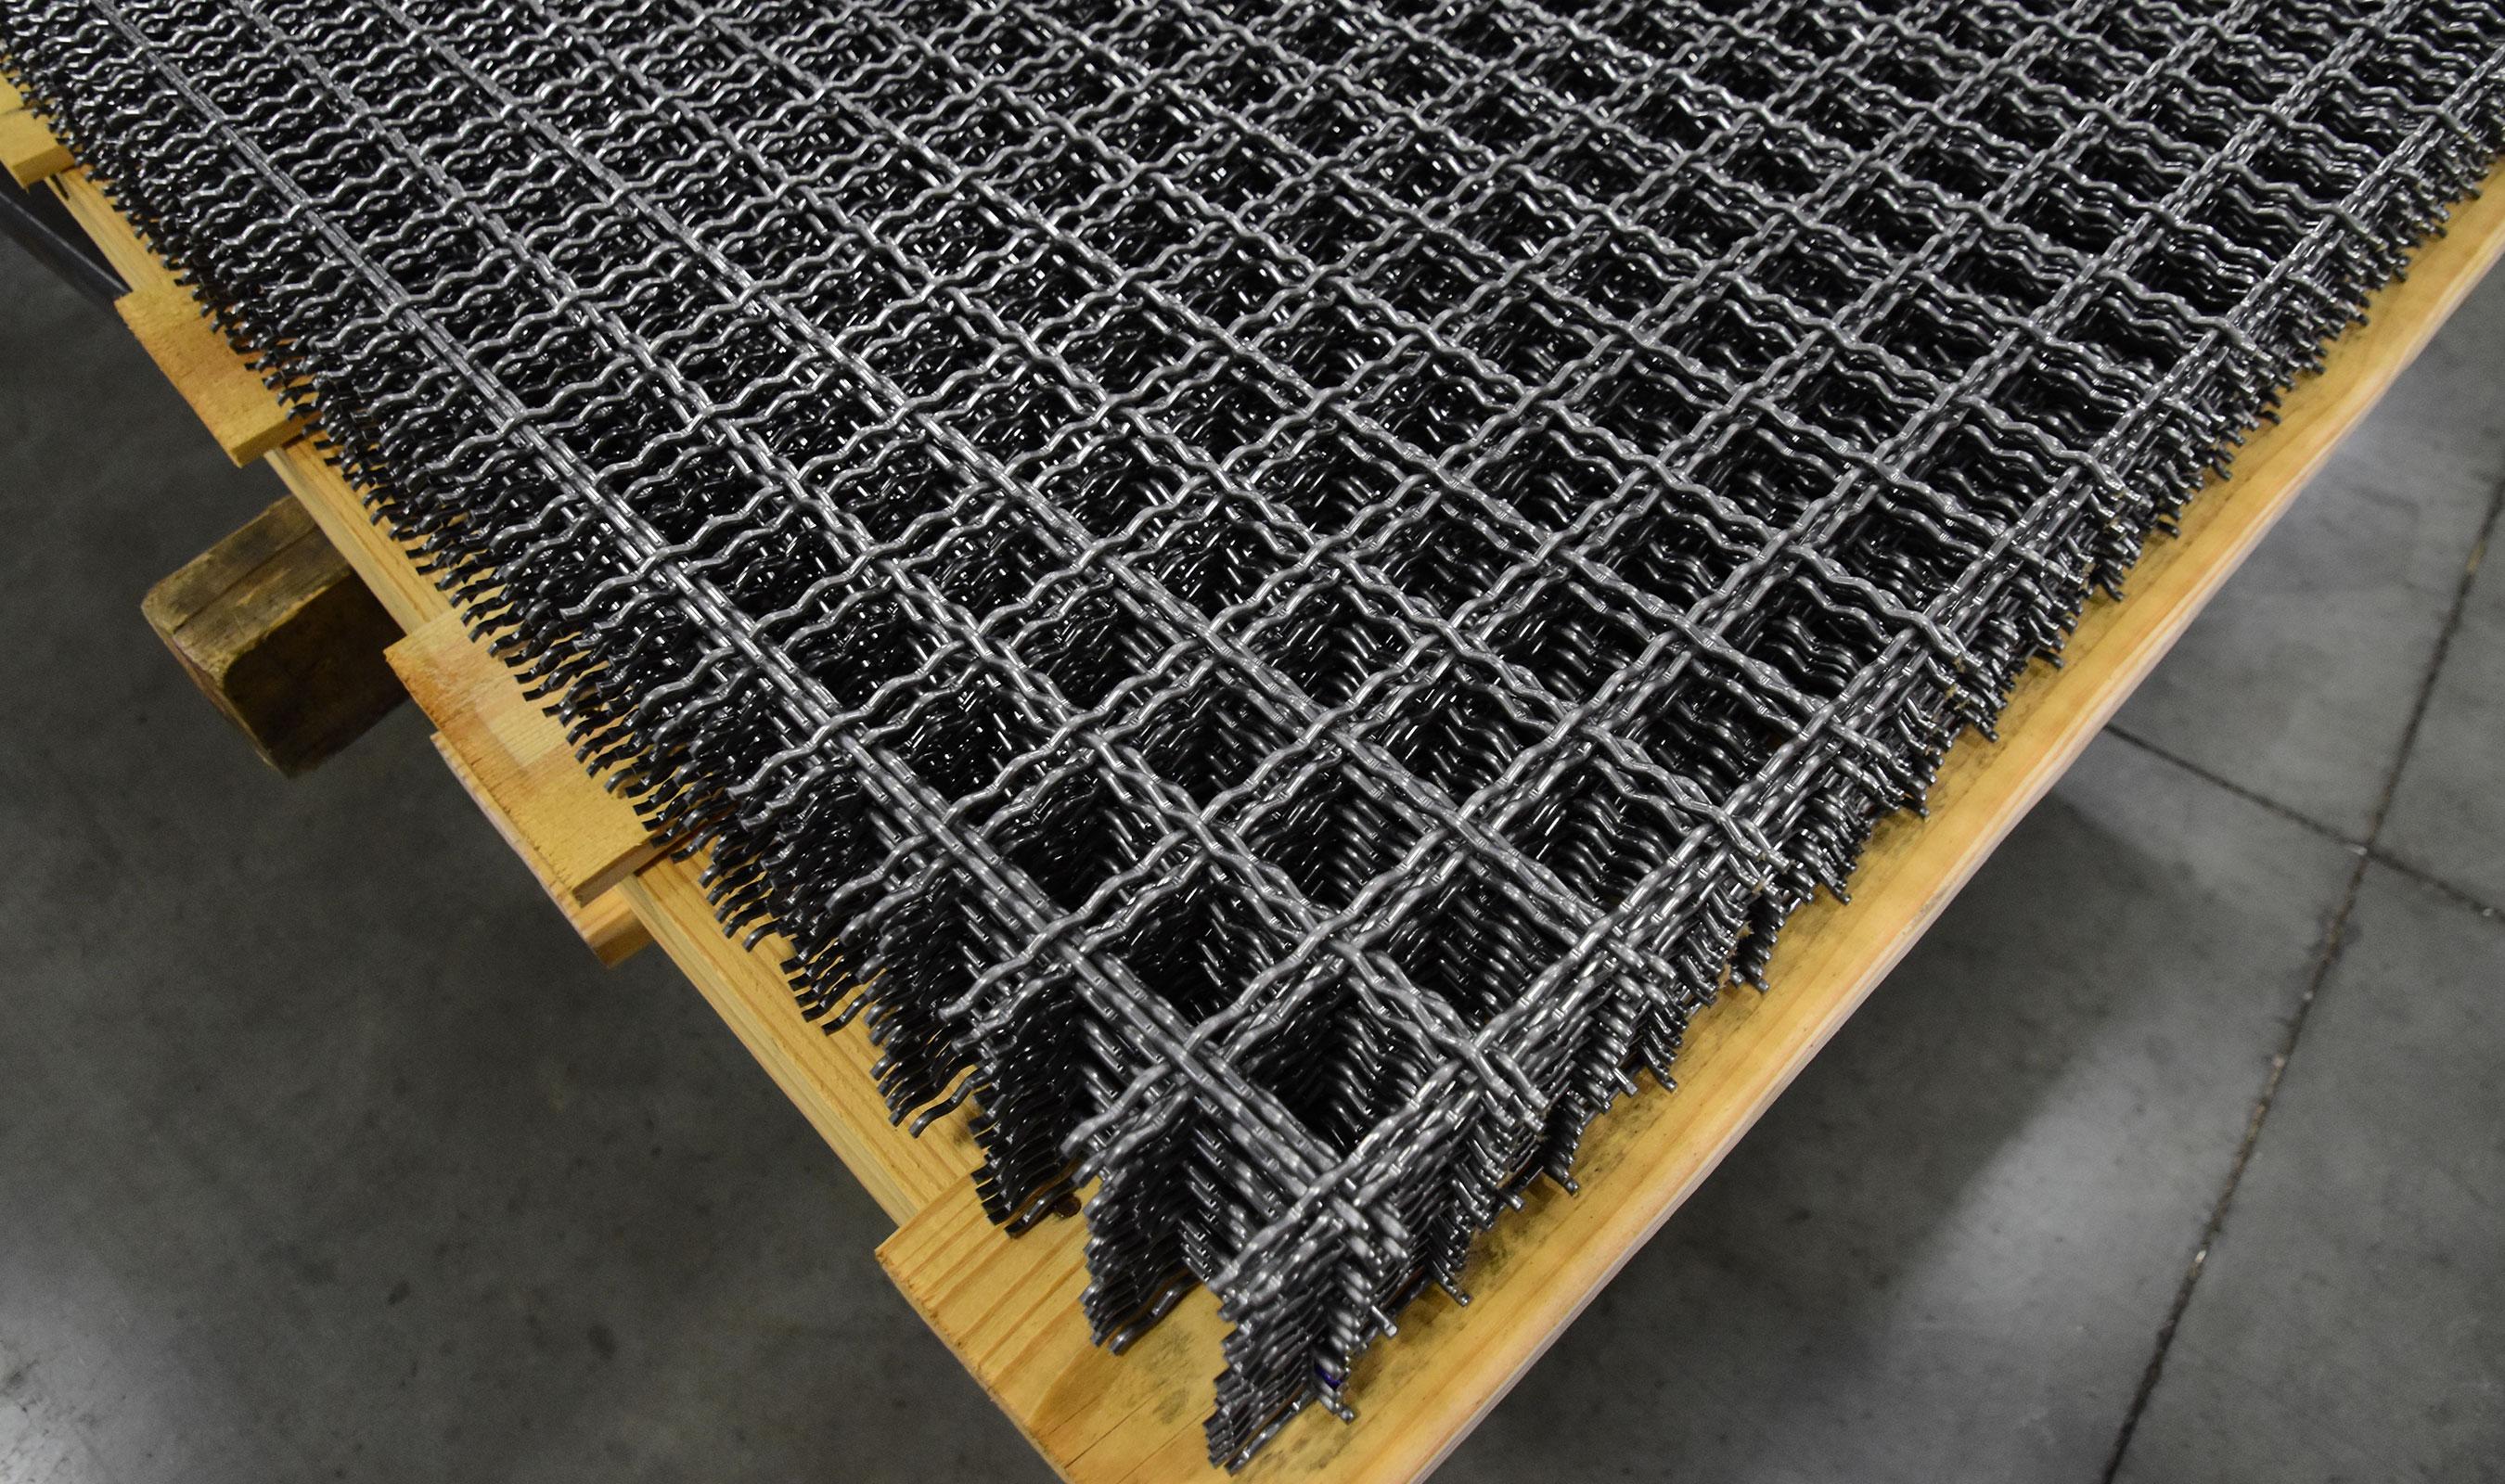 I-48 plain steel woven wire mesh